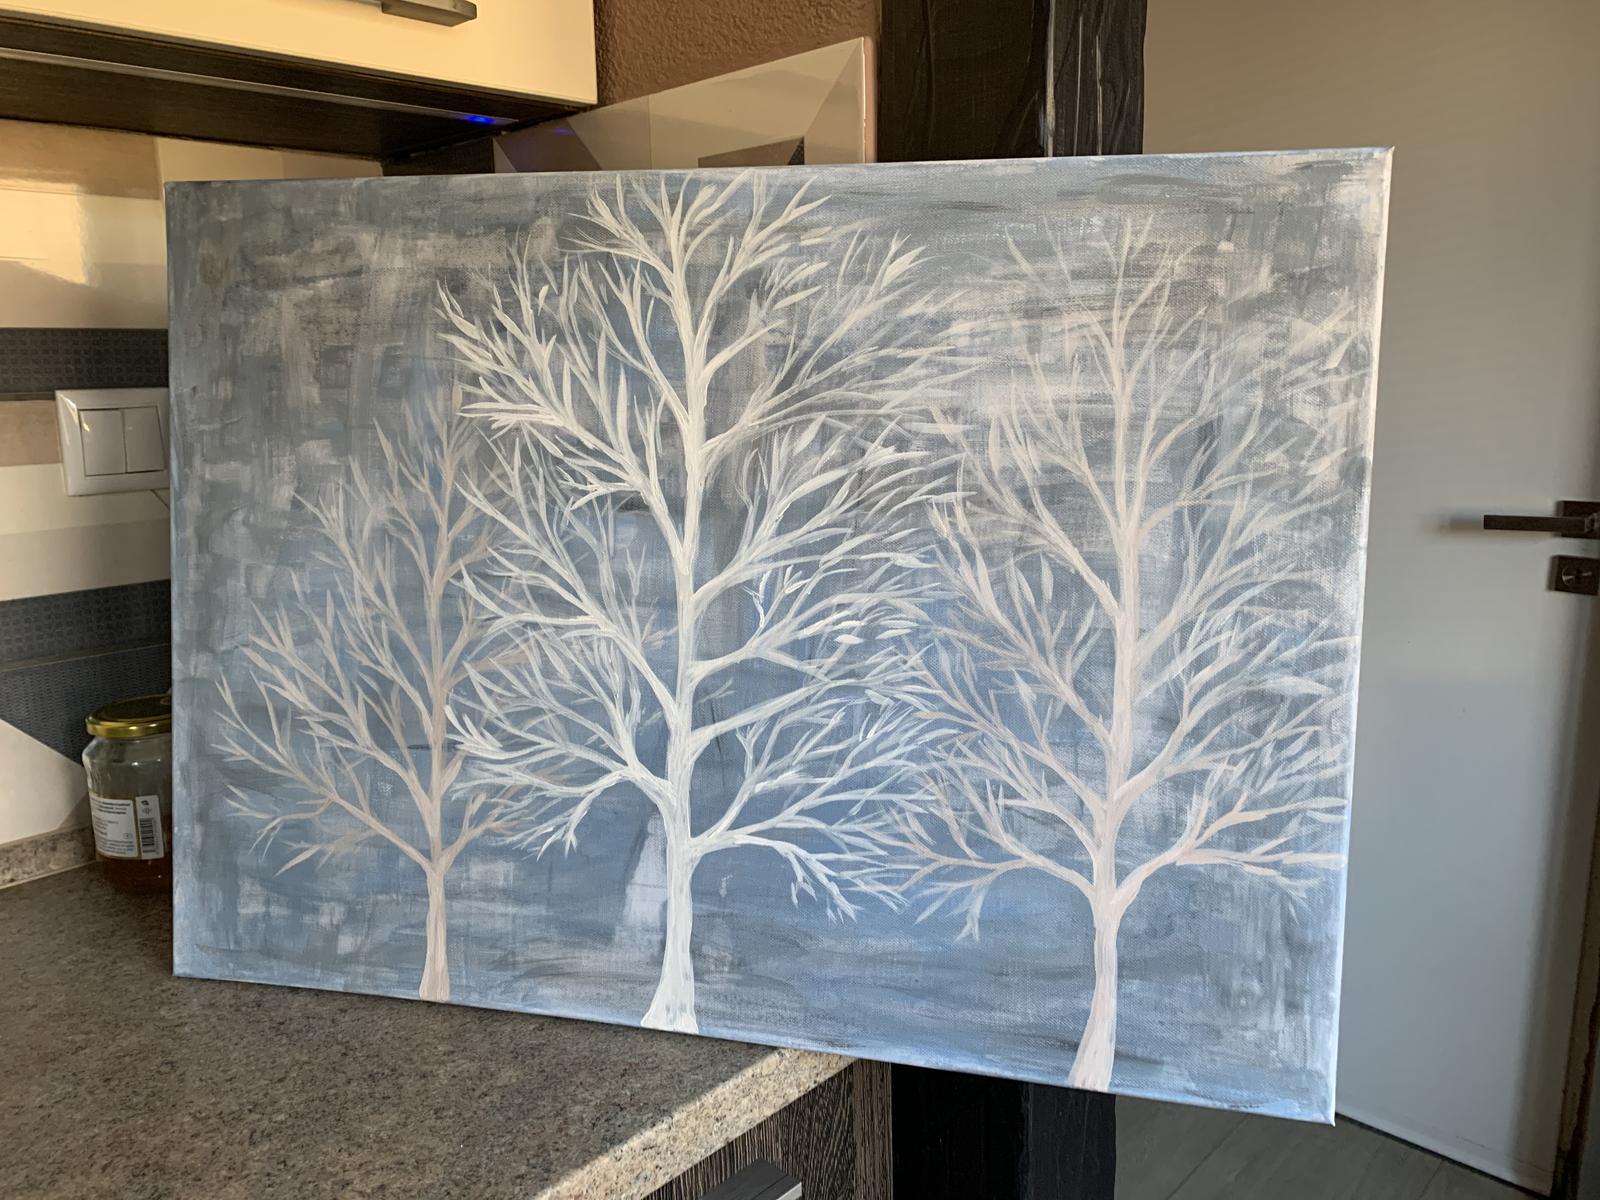 Obraz abstract Stromy - Obrázok č. 1